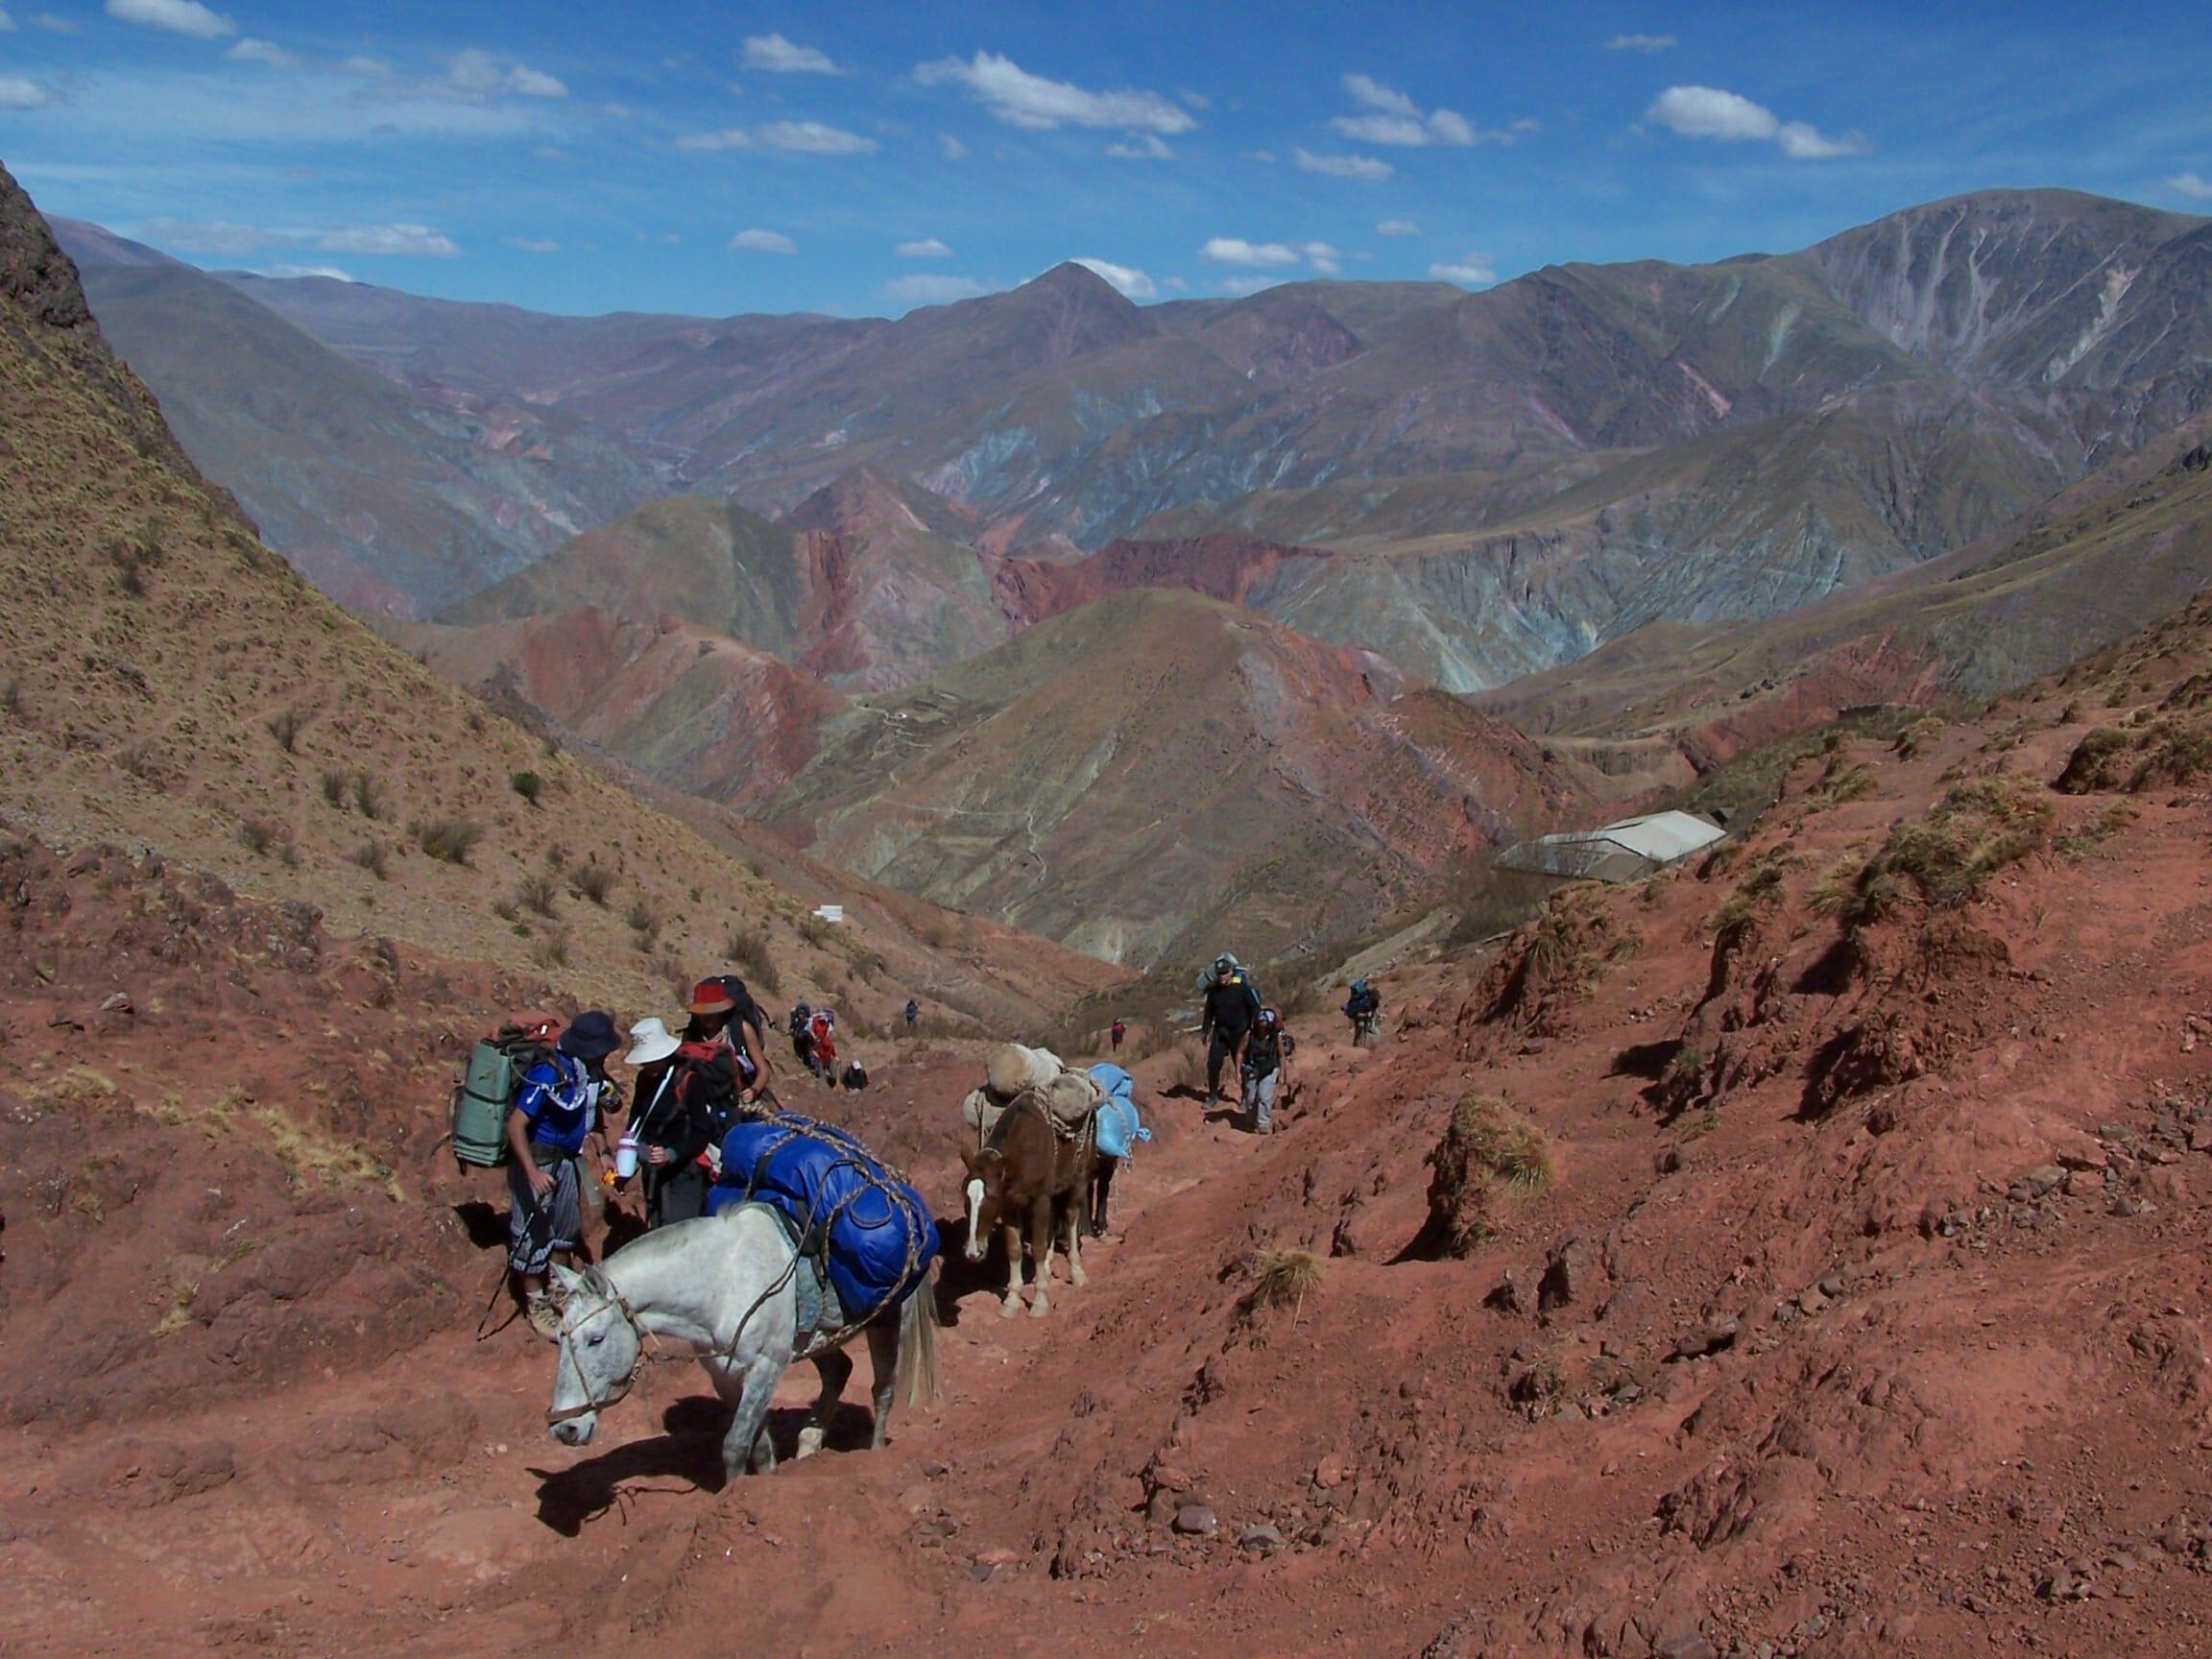 Trekking Chiyayoc El Abra Salta Argentina